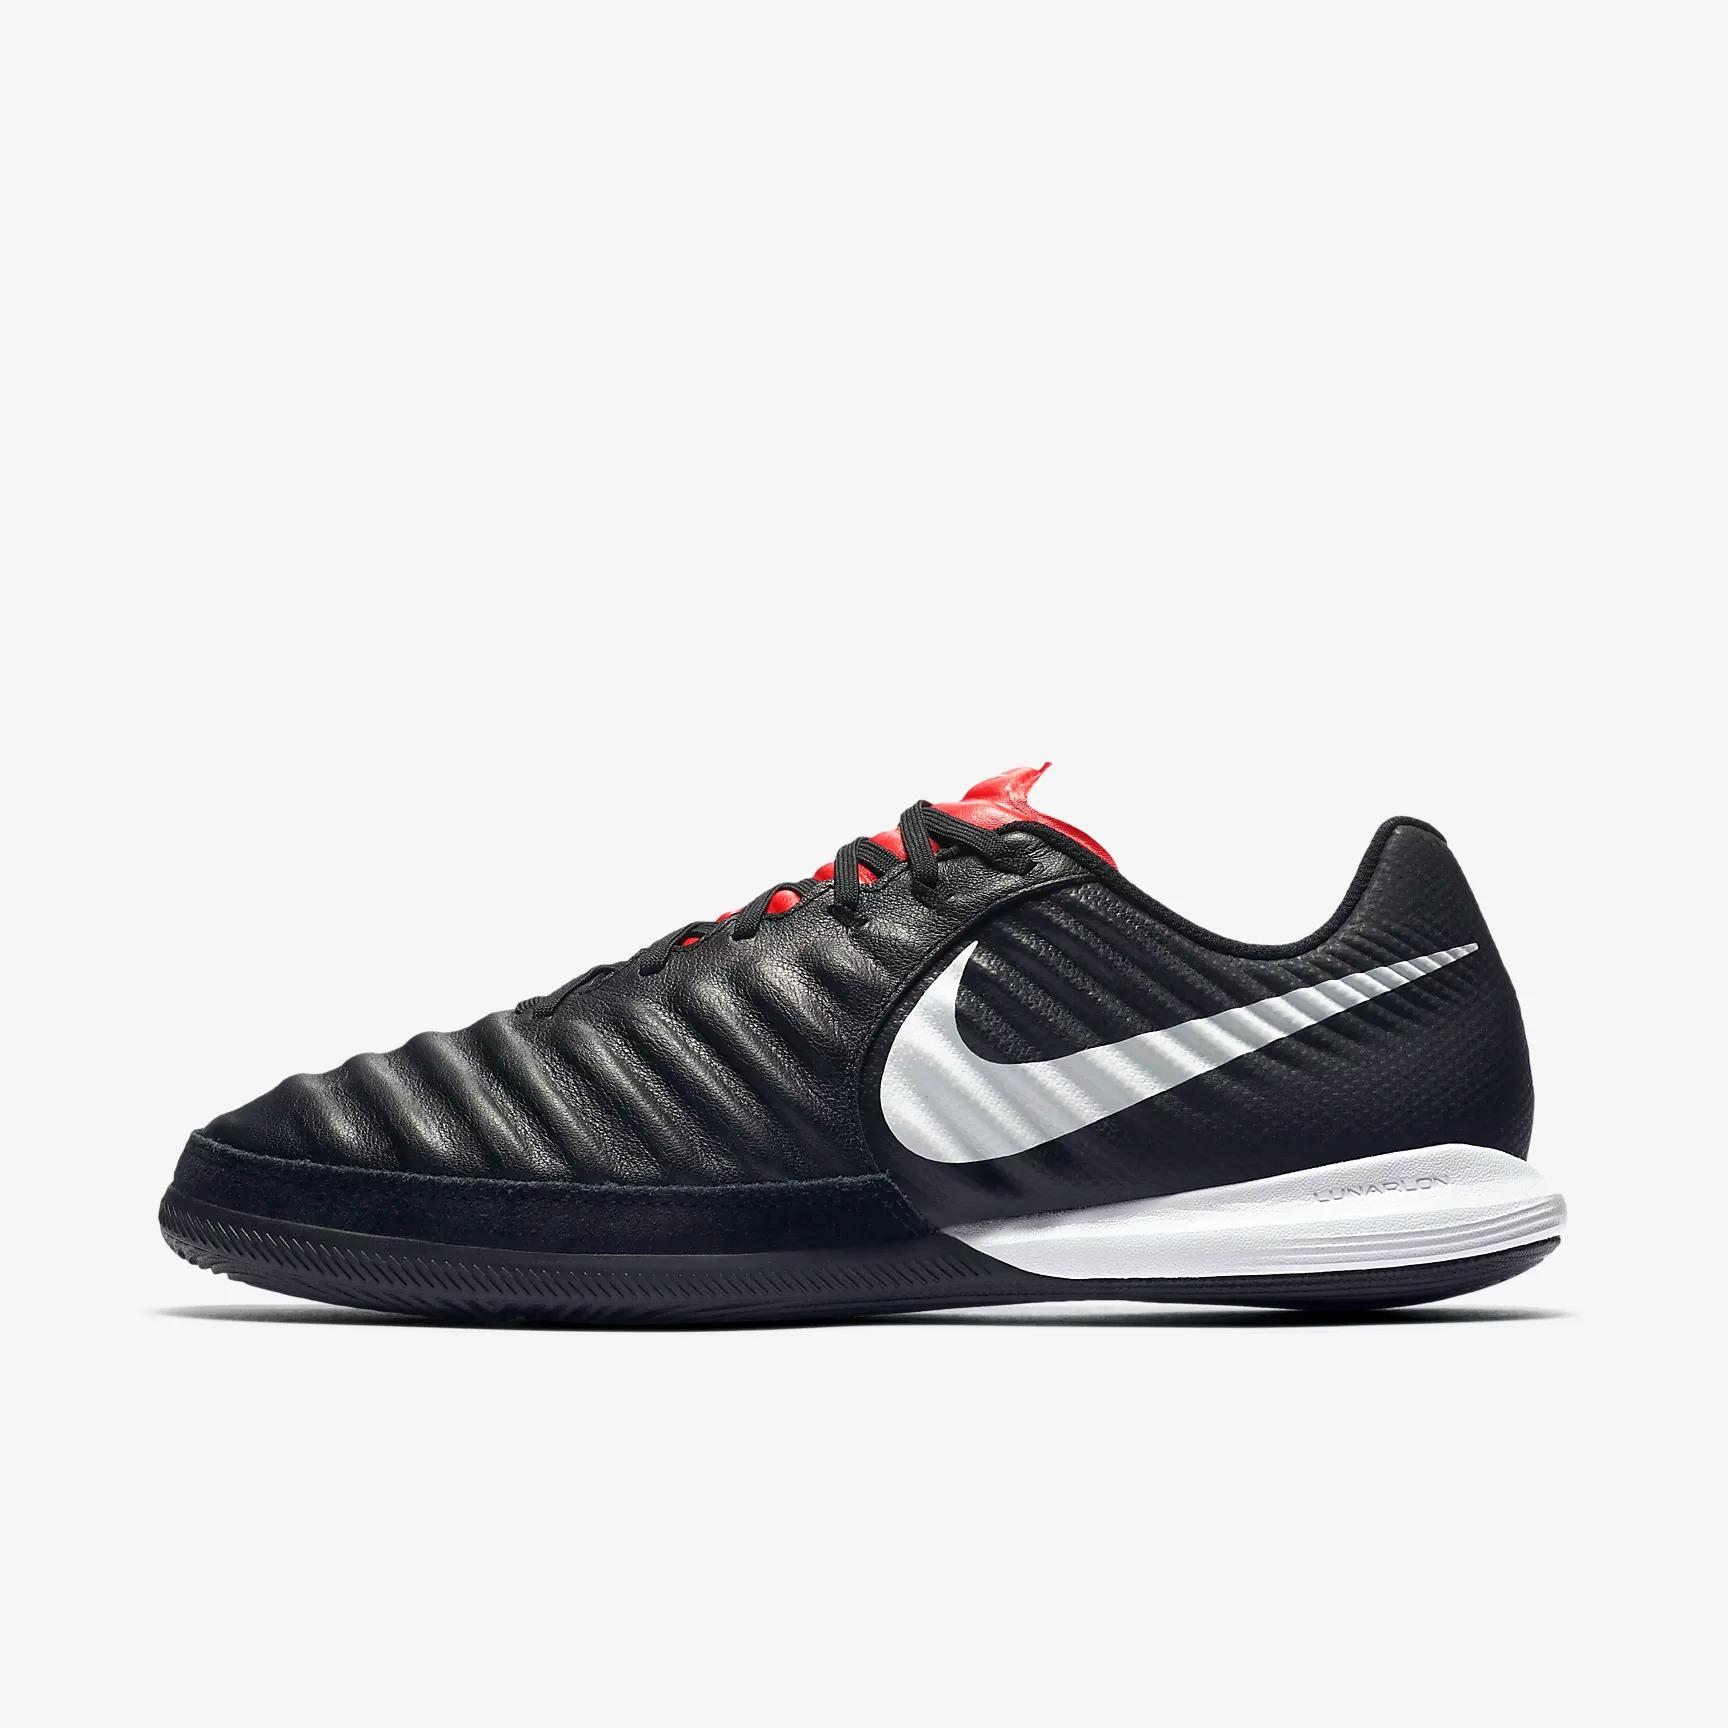 dc5dee964 Nike TiempoX Lunar Legend VII Pro IC Soccer Cleats - Soccer Cleats ...